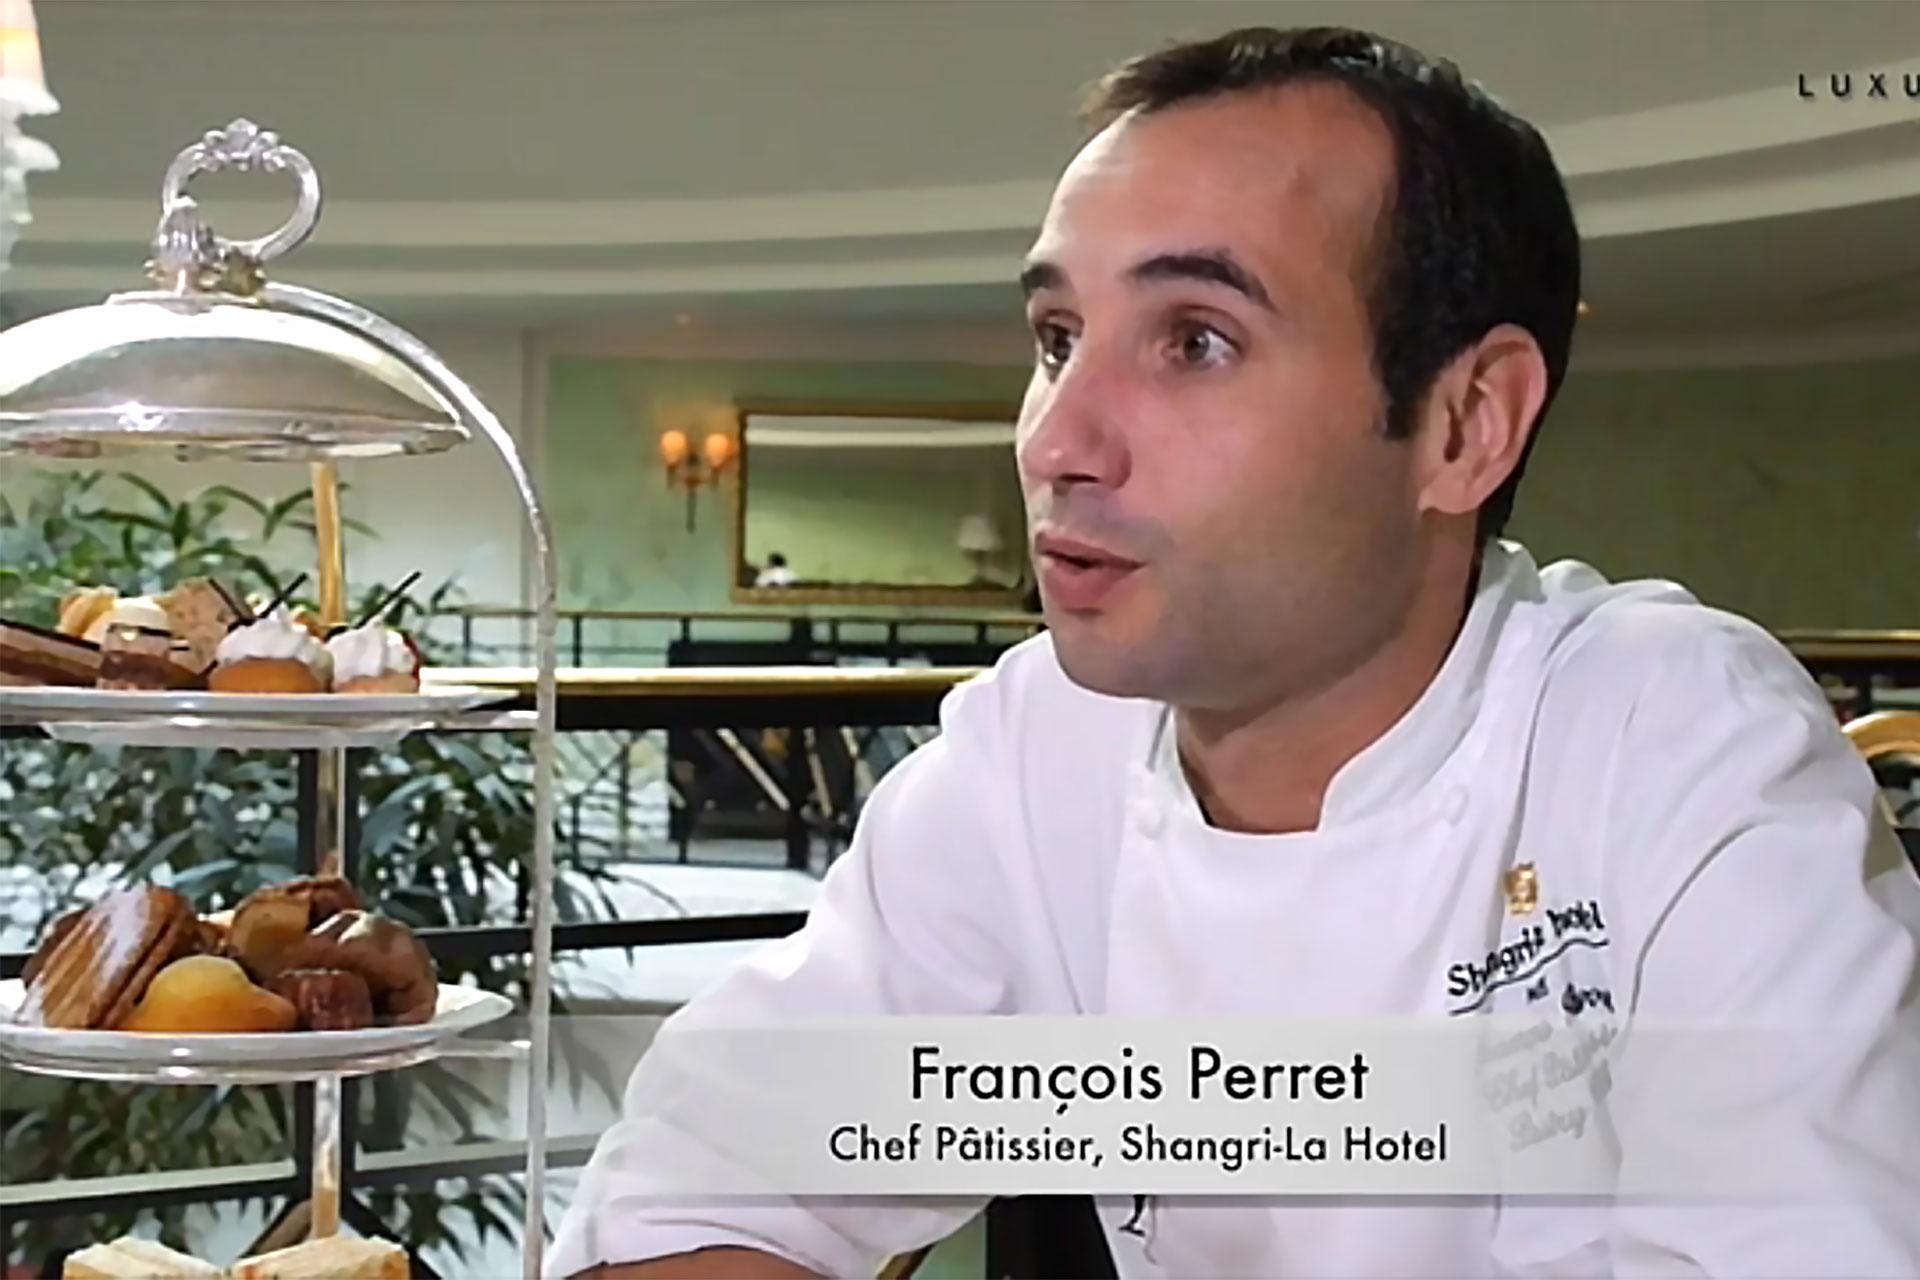 François Perret. Chef pâtissier Shangri-La Hotel